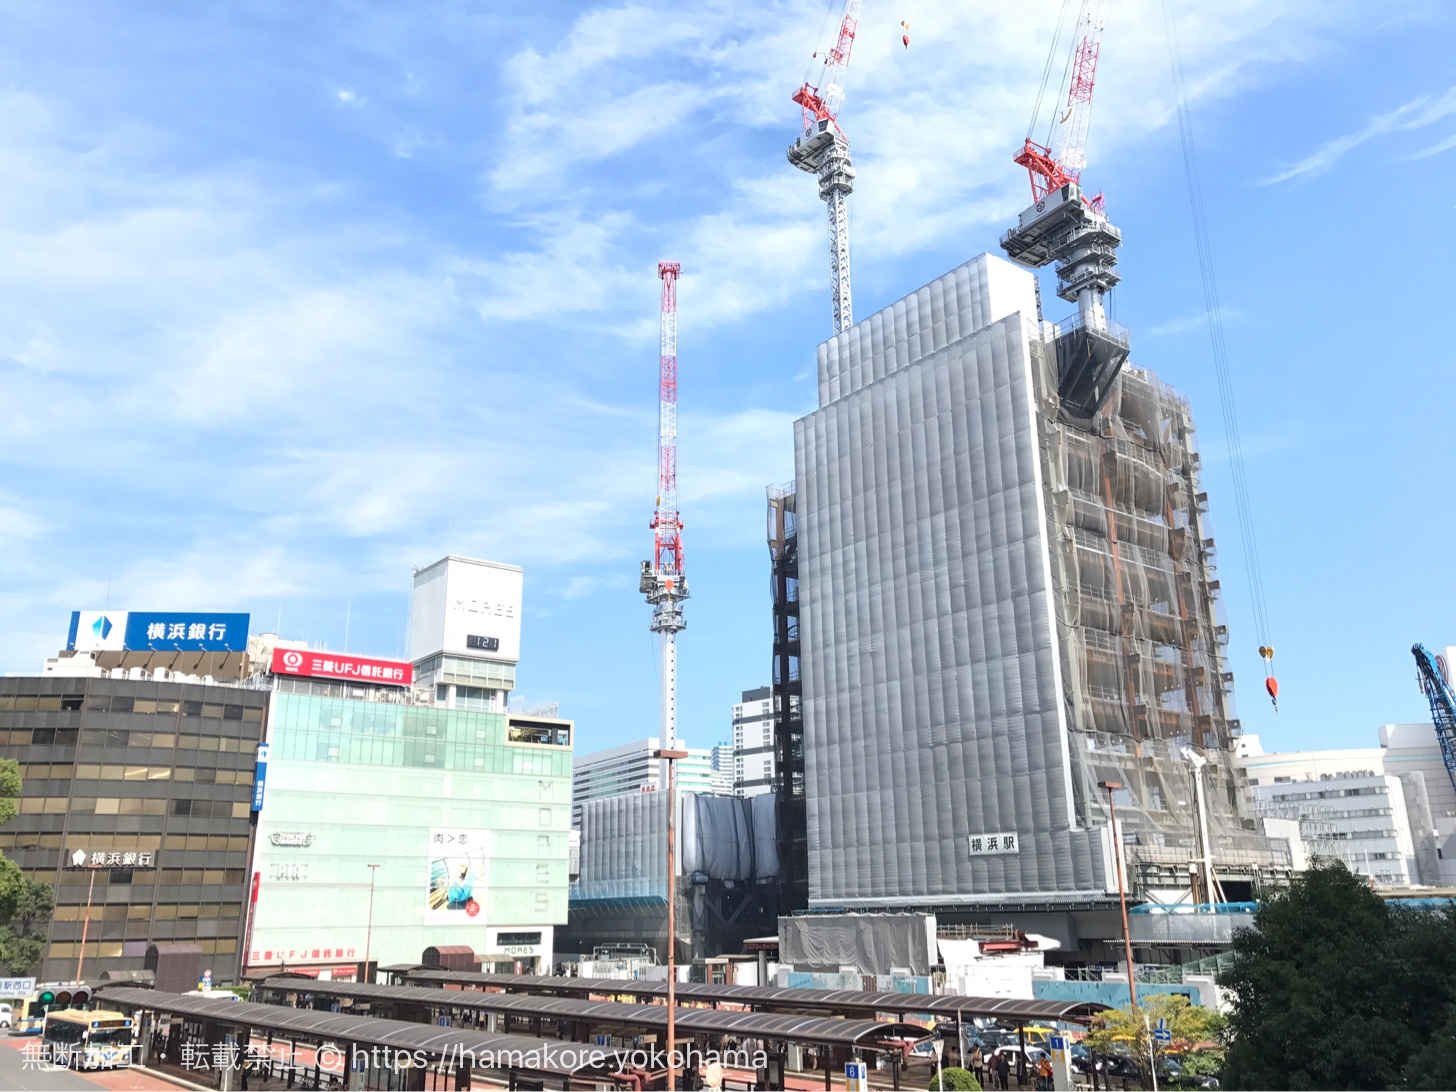 2017年9月 横浜駅西口の様子